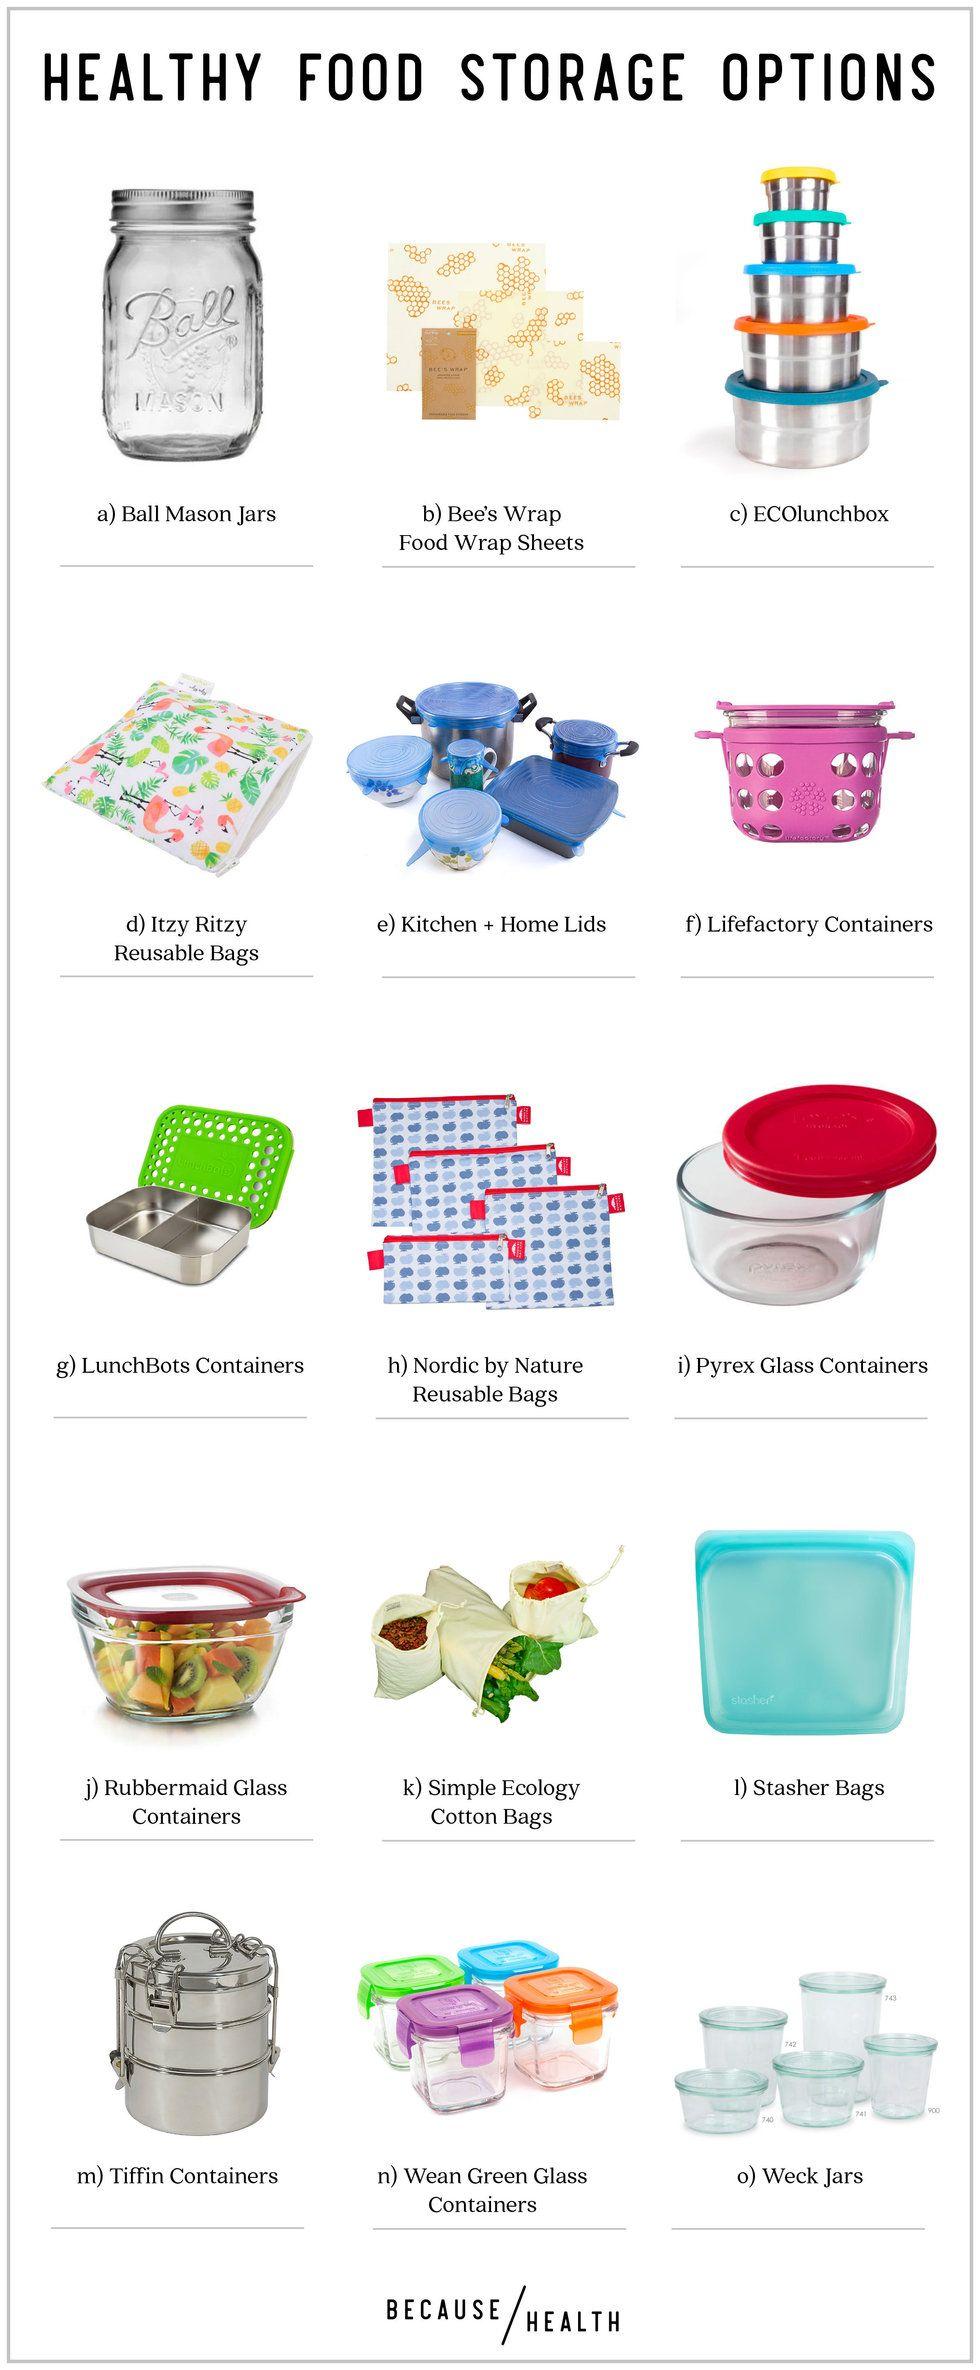 15 Healthy Food Storage Options